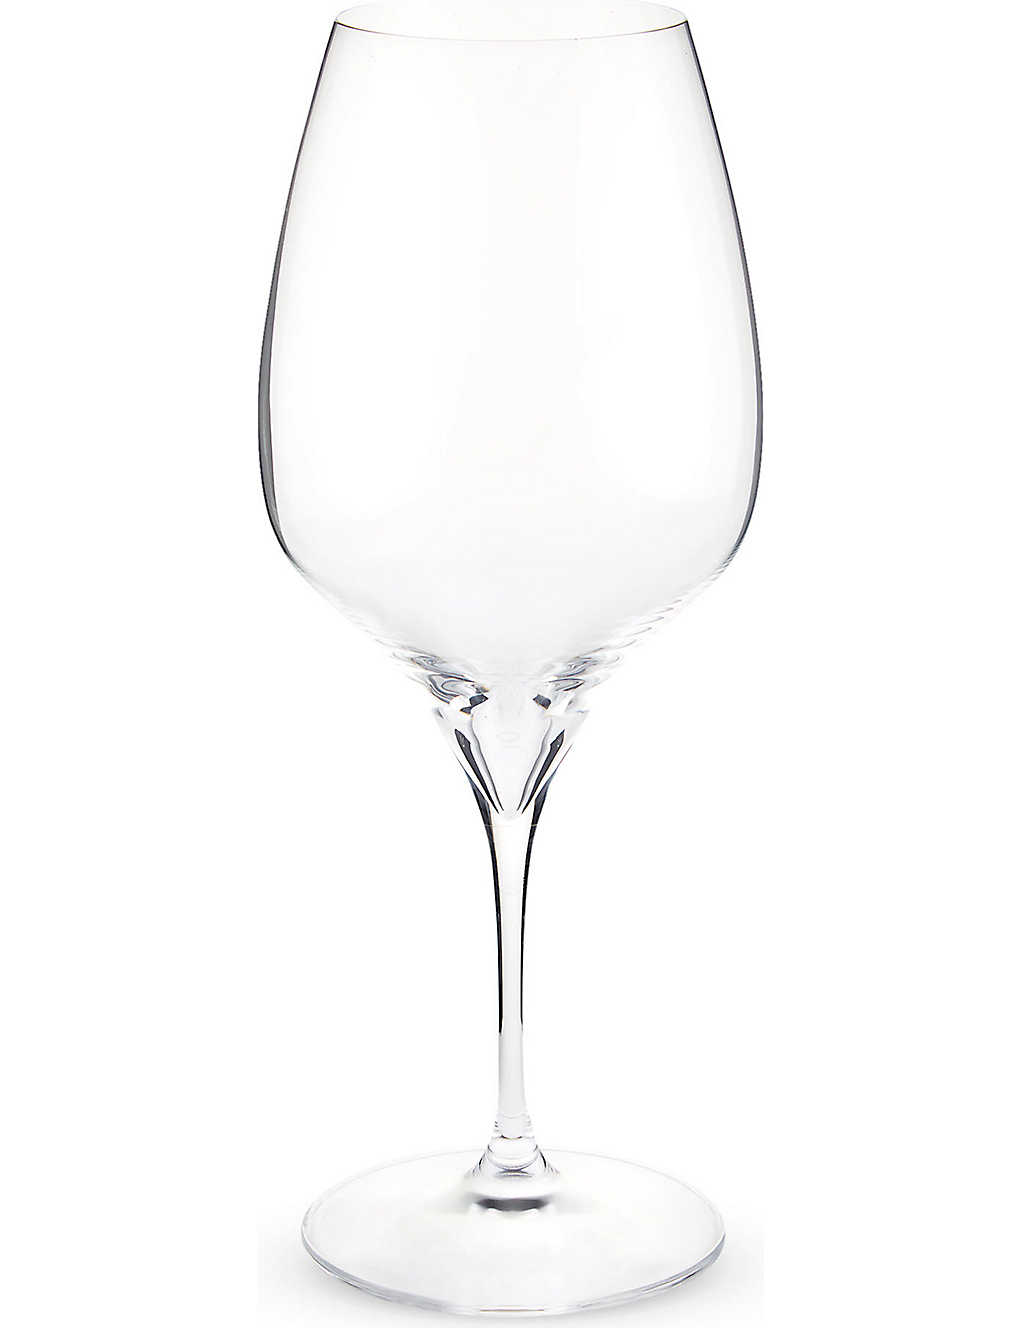 27b969d9ef8 RIEDEL - Vitis pair of Cabernet Merlot glasses   Selfridges.com